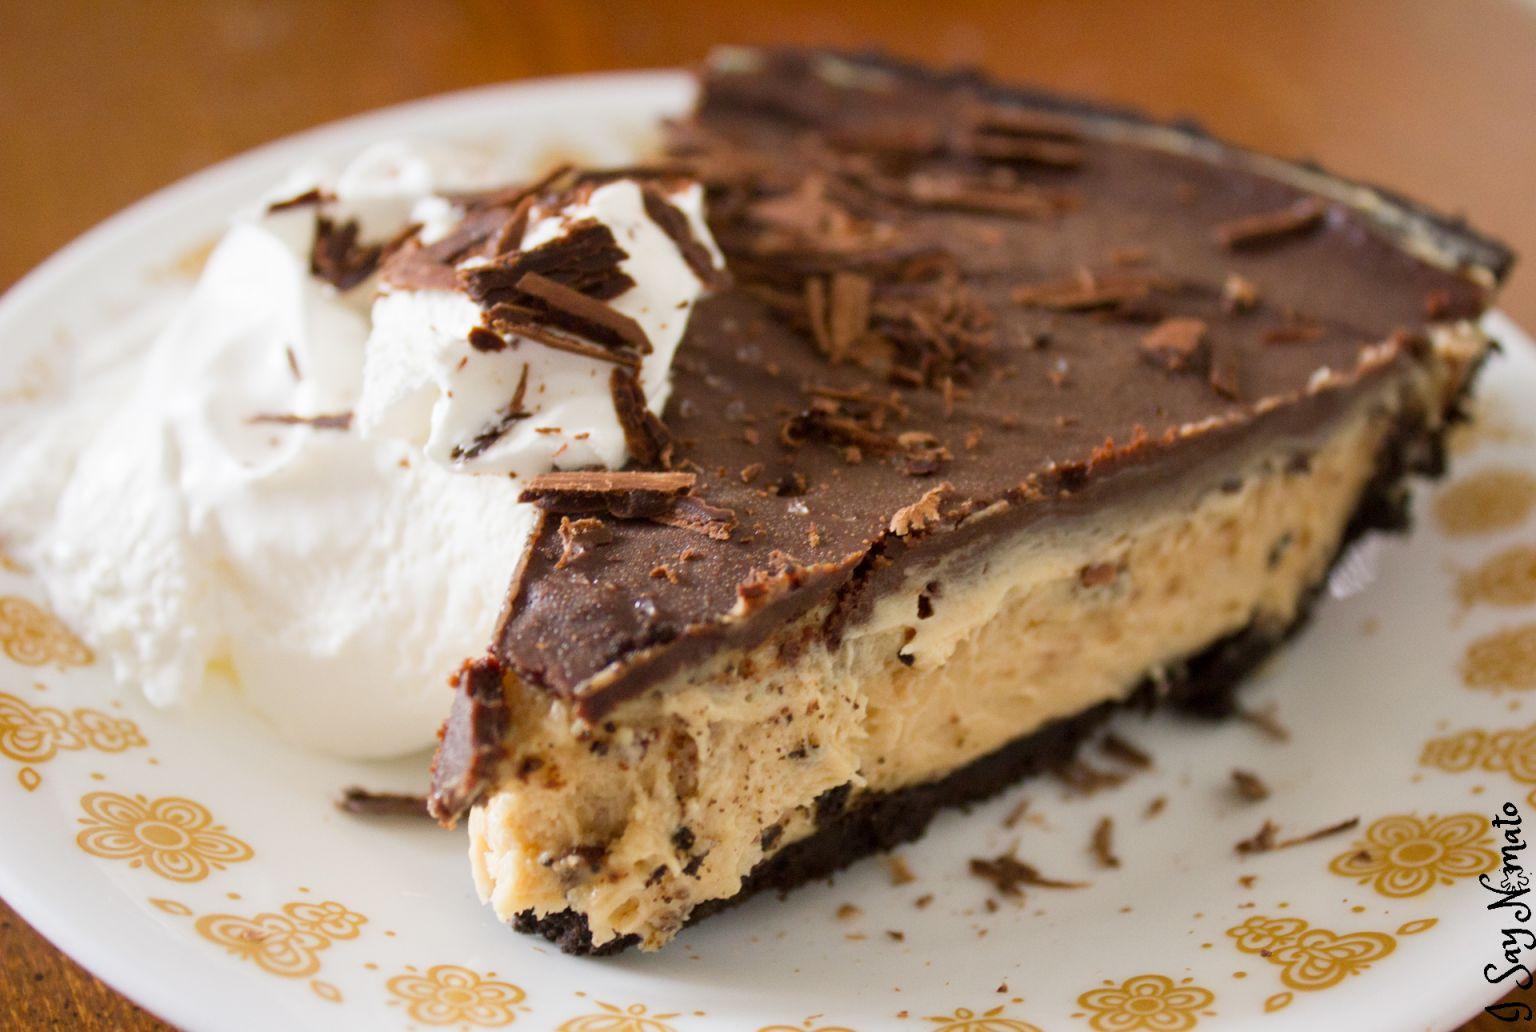 Peanut Butter Pie Without Cream Cheese  Peanut Butter Pie with Sea Salt and Dark Chocolate Ganache